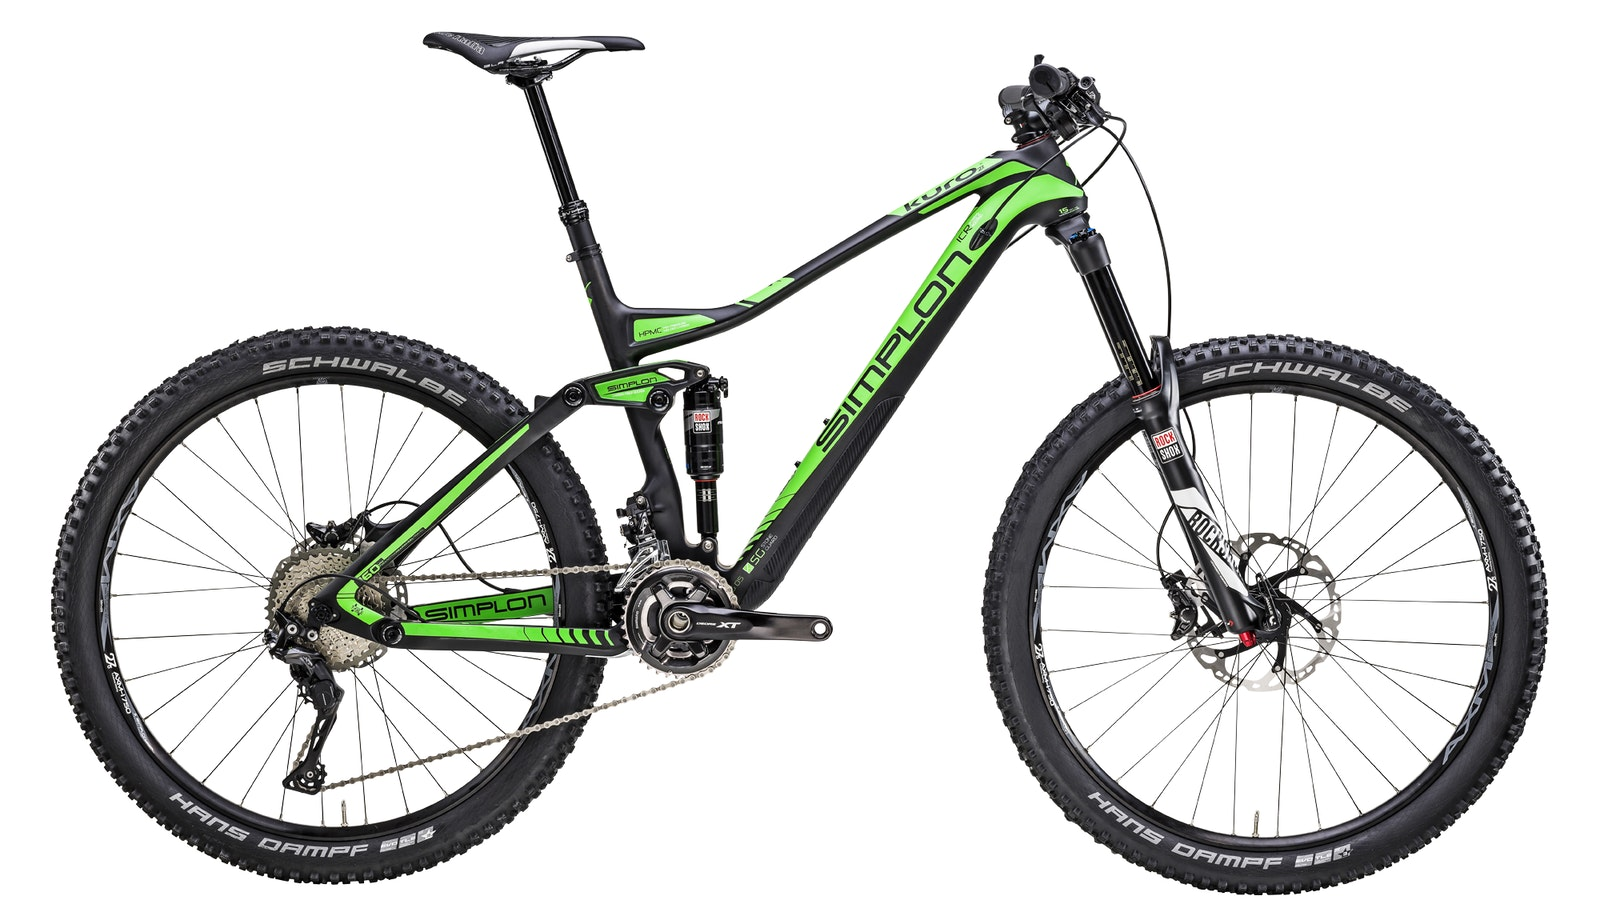 simplon kuro pro 275 carbon 2016 100149539 bikeexchange. Black Bedroom Furniture Sets. Home Design Ideas